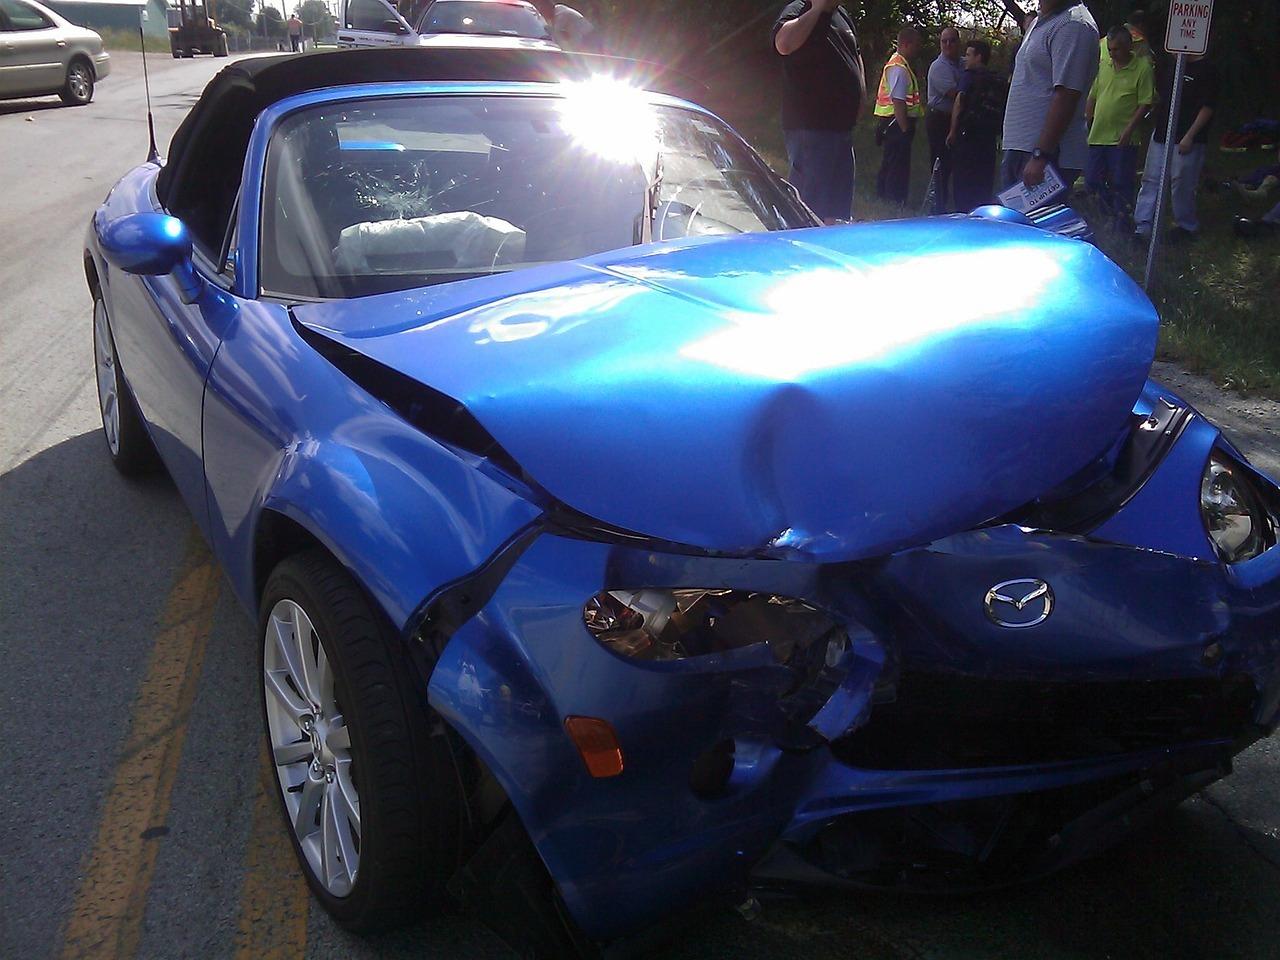 A car needing repairs